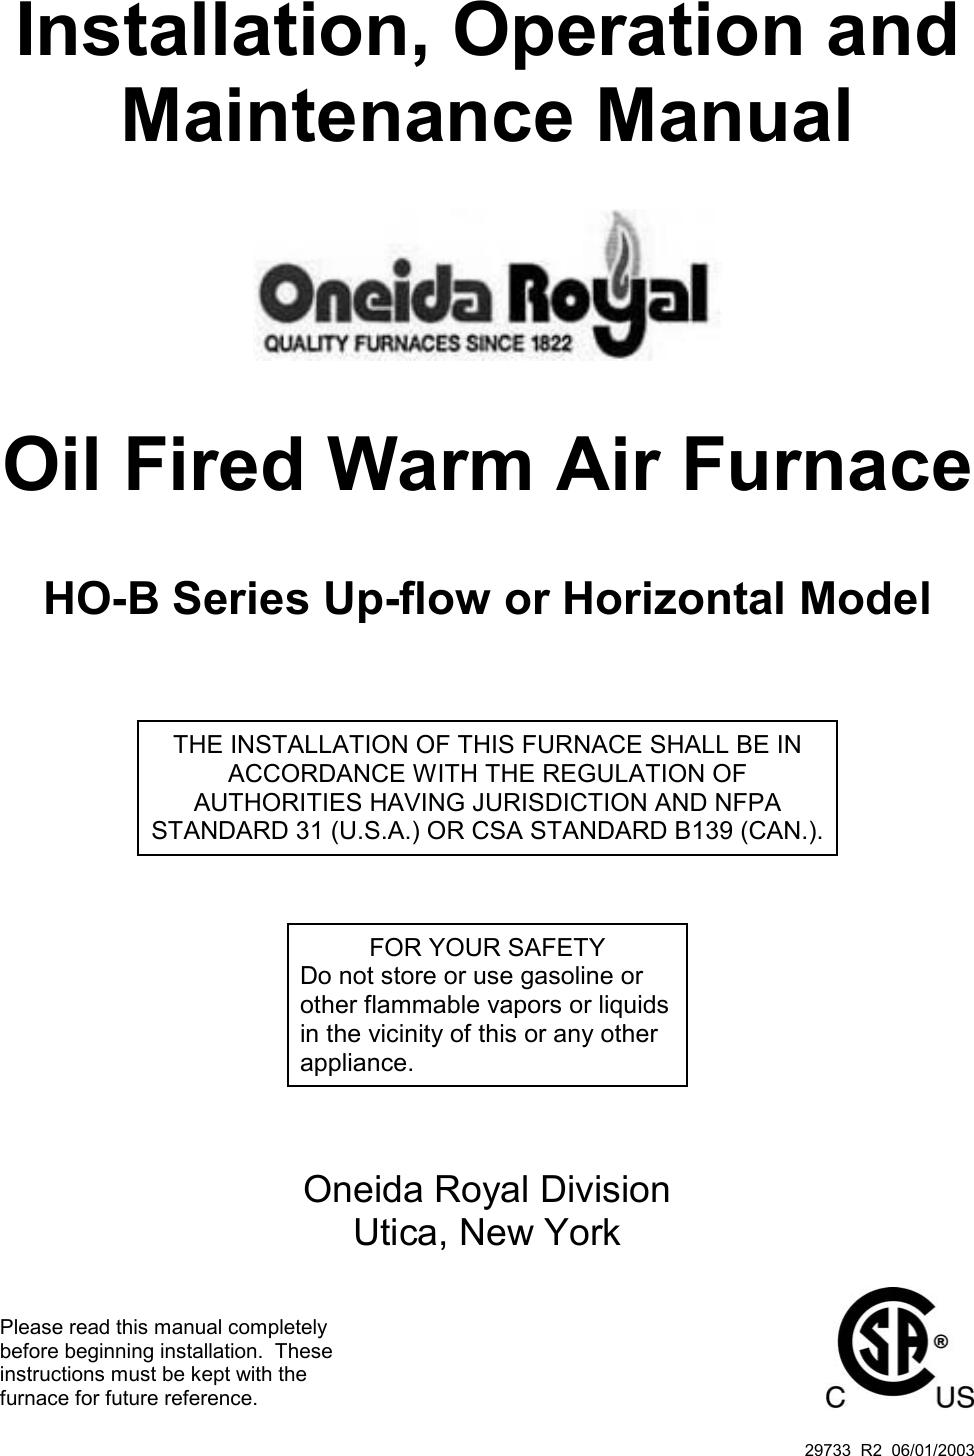 Royal Appliance Air Furnace Users Manual 29733 R2 06 01 03 Oneida Case Ih Wiring Schematic 1822 Ho B Installation Instruc